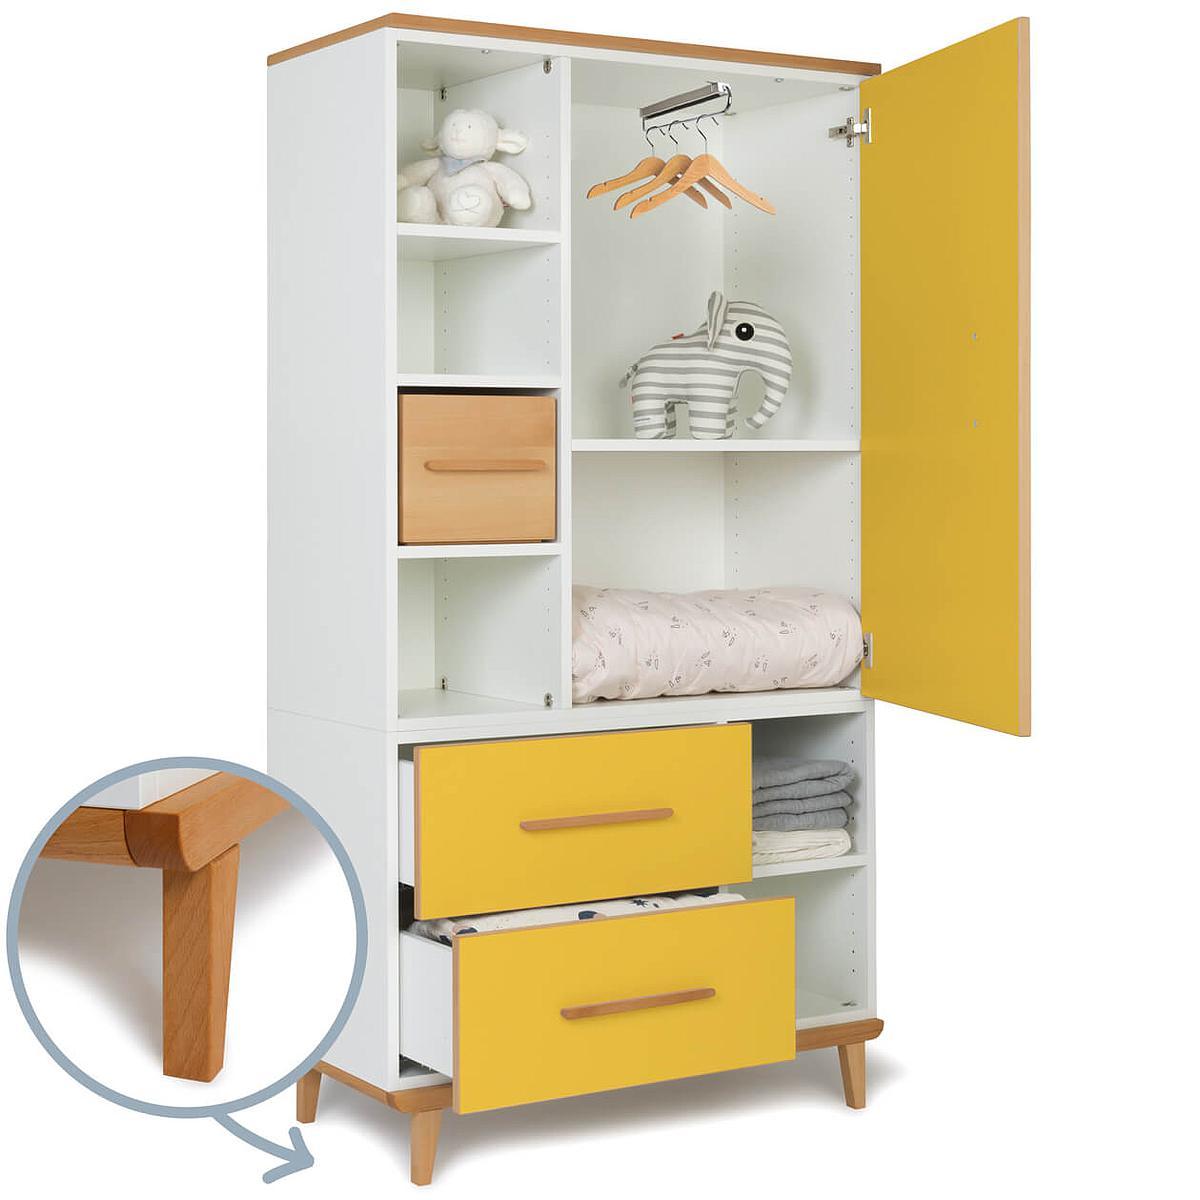 Armario 173cm 1 puerta 2 cajones NADO sunshine yellow